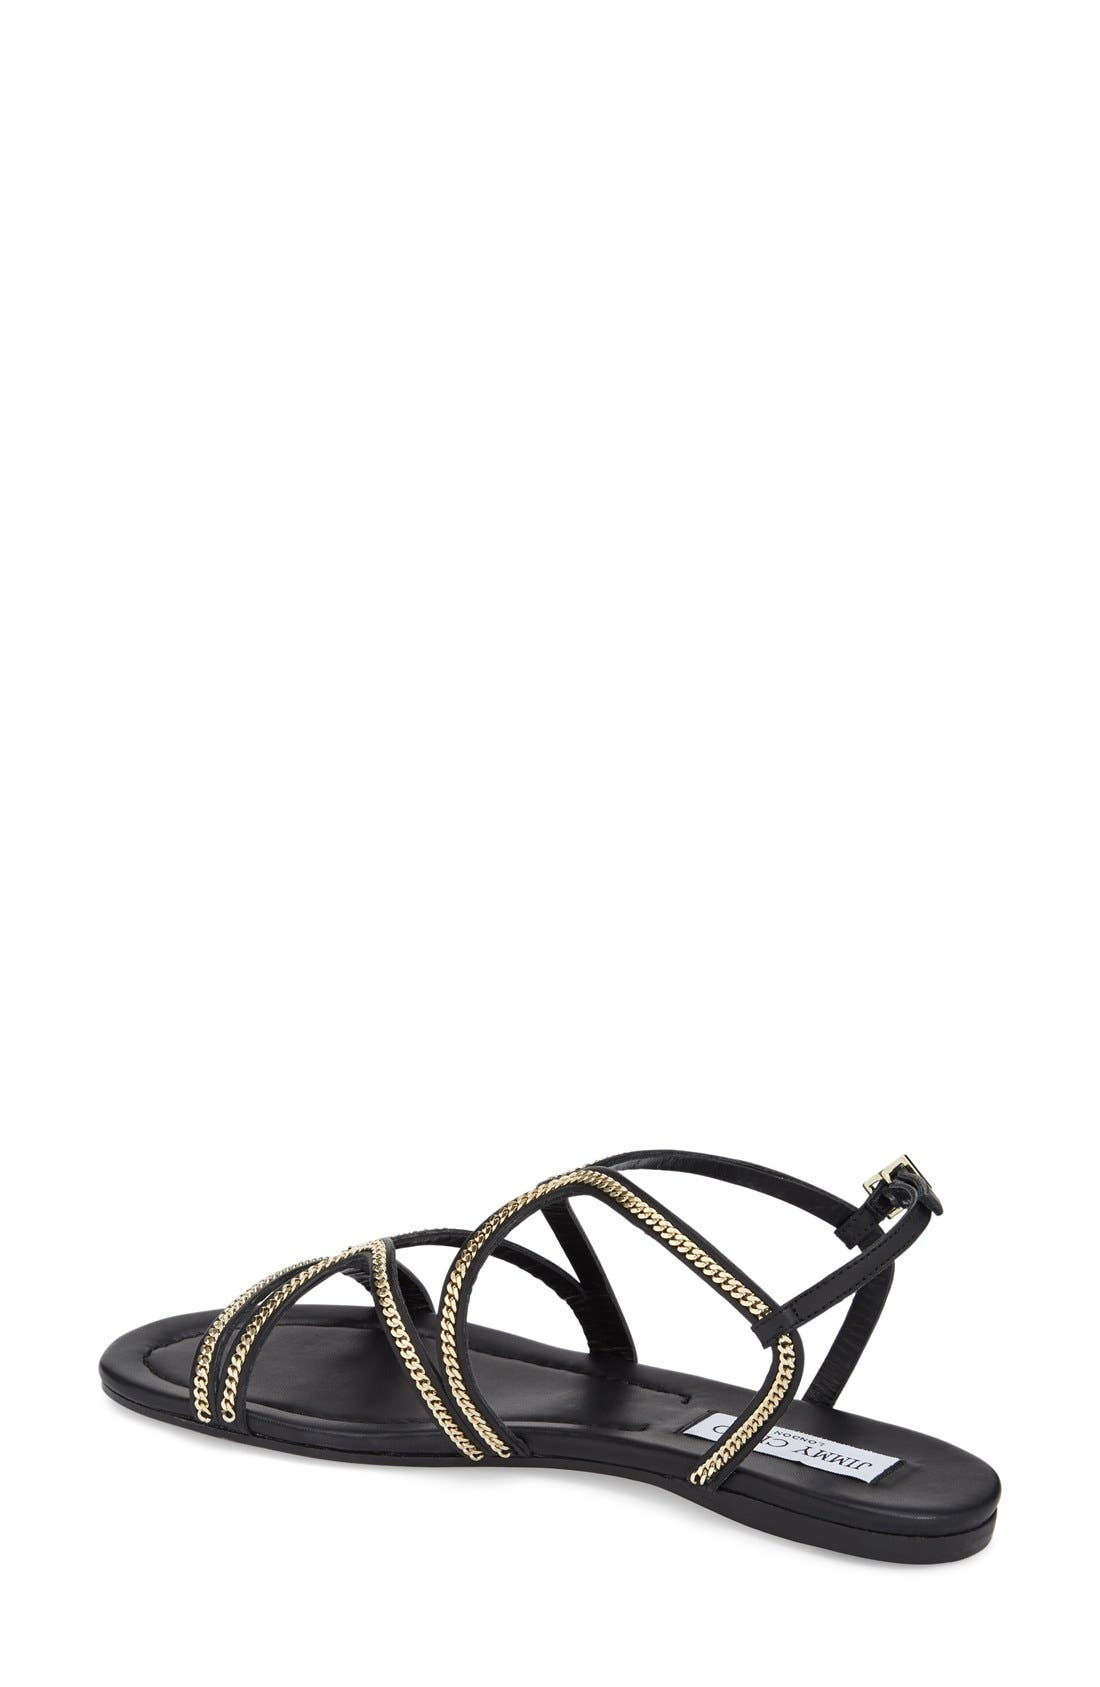 'Nickel' Sandal,                             Alternate thumbnail 2, color,                             Black Leather